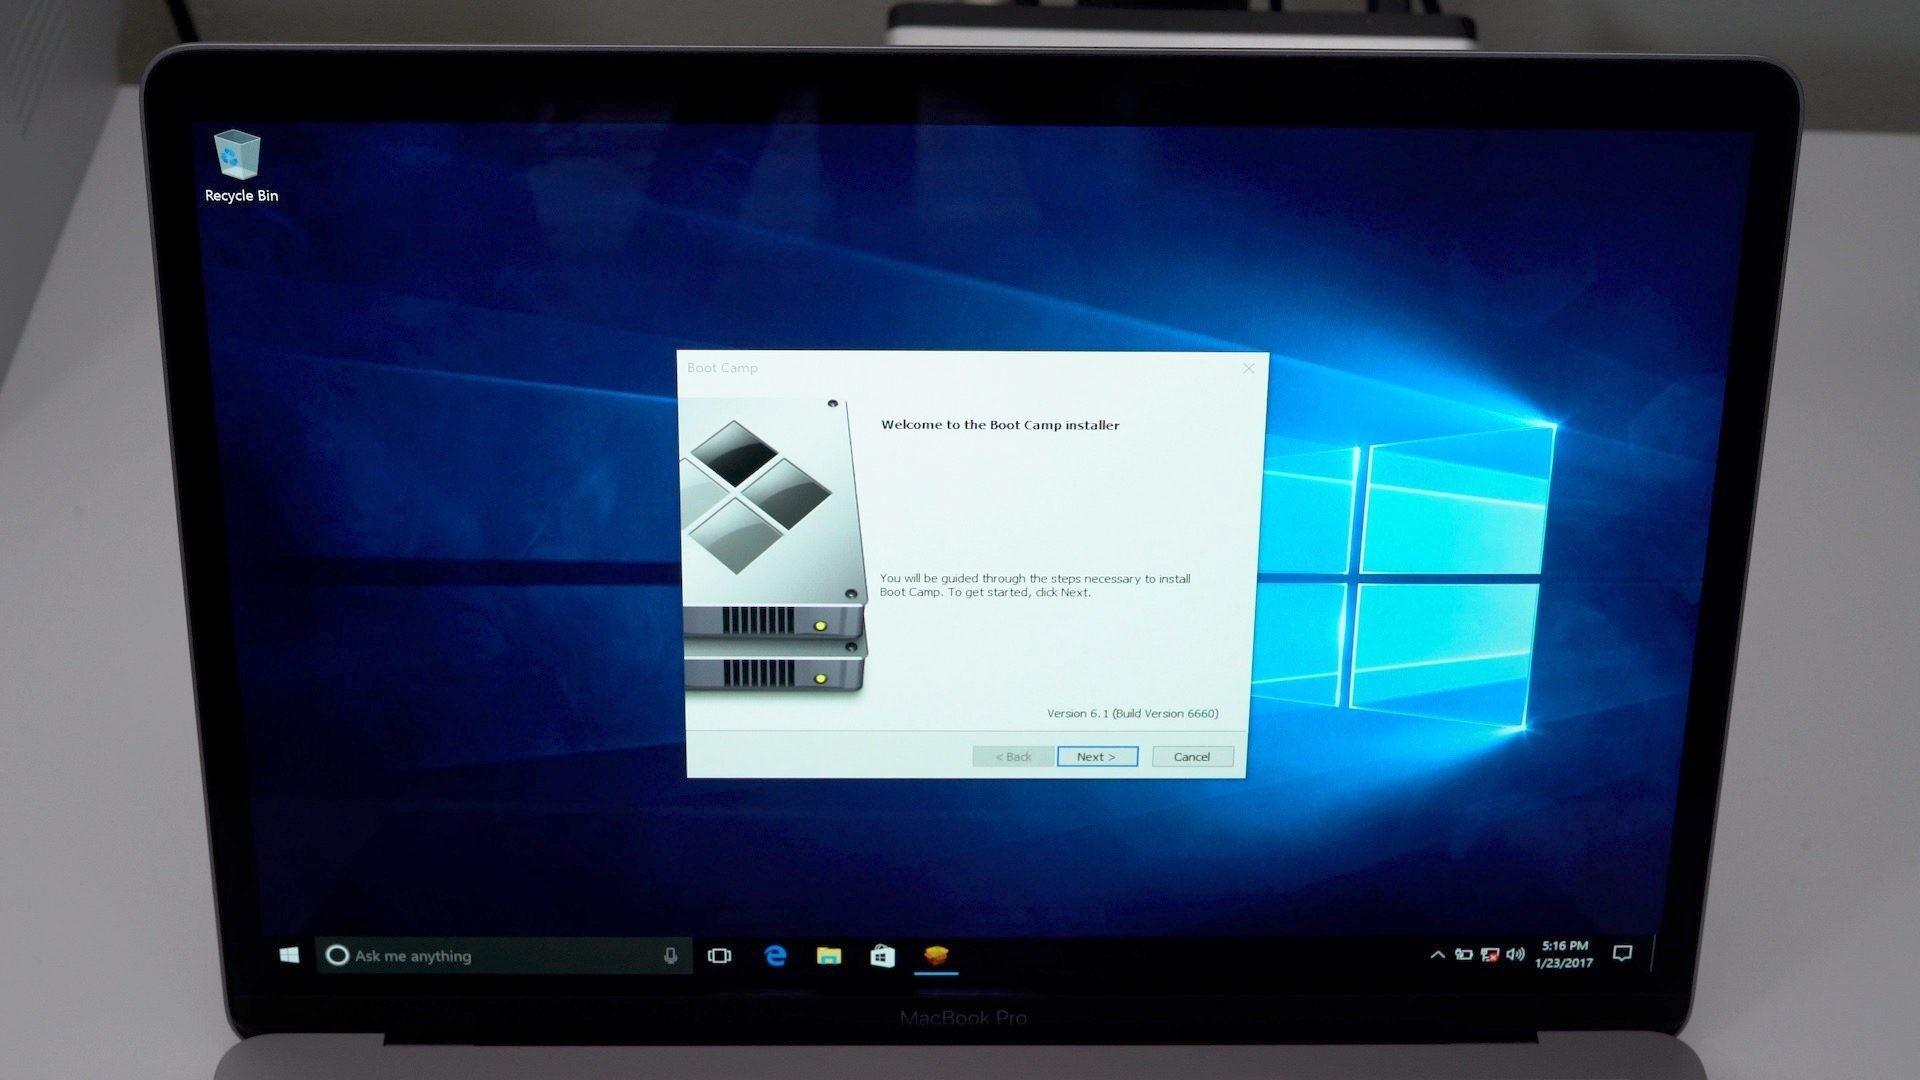 boot-camp-installer-windows-10